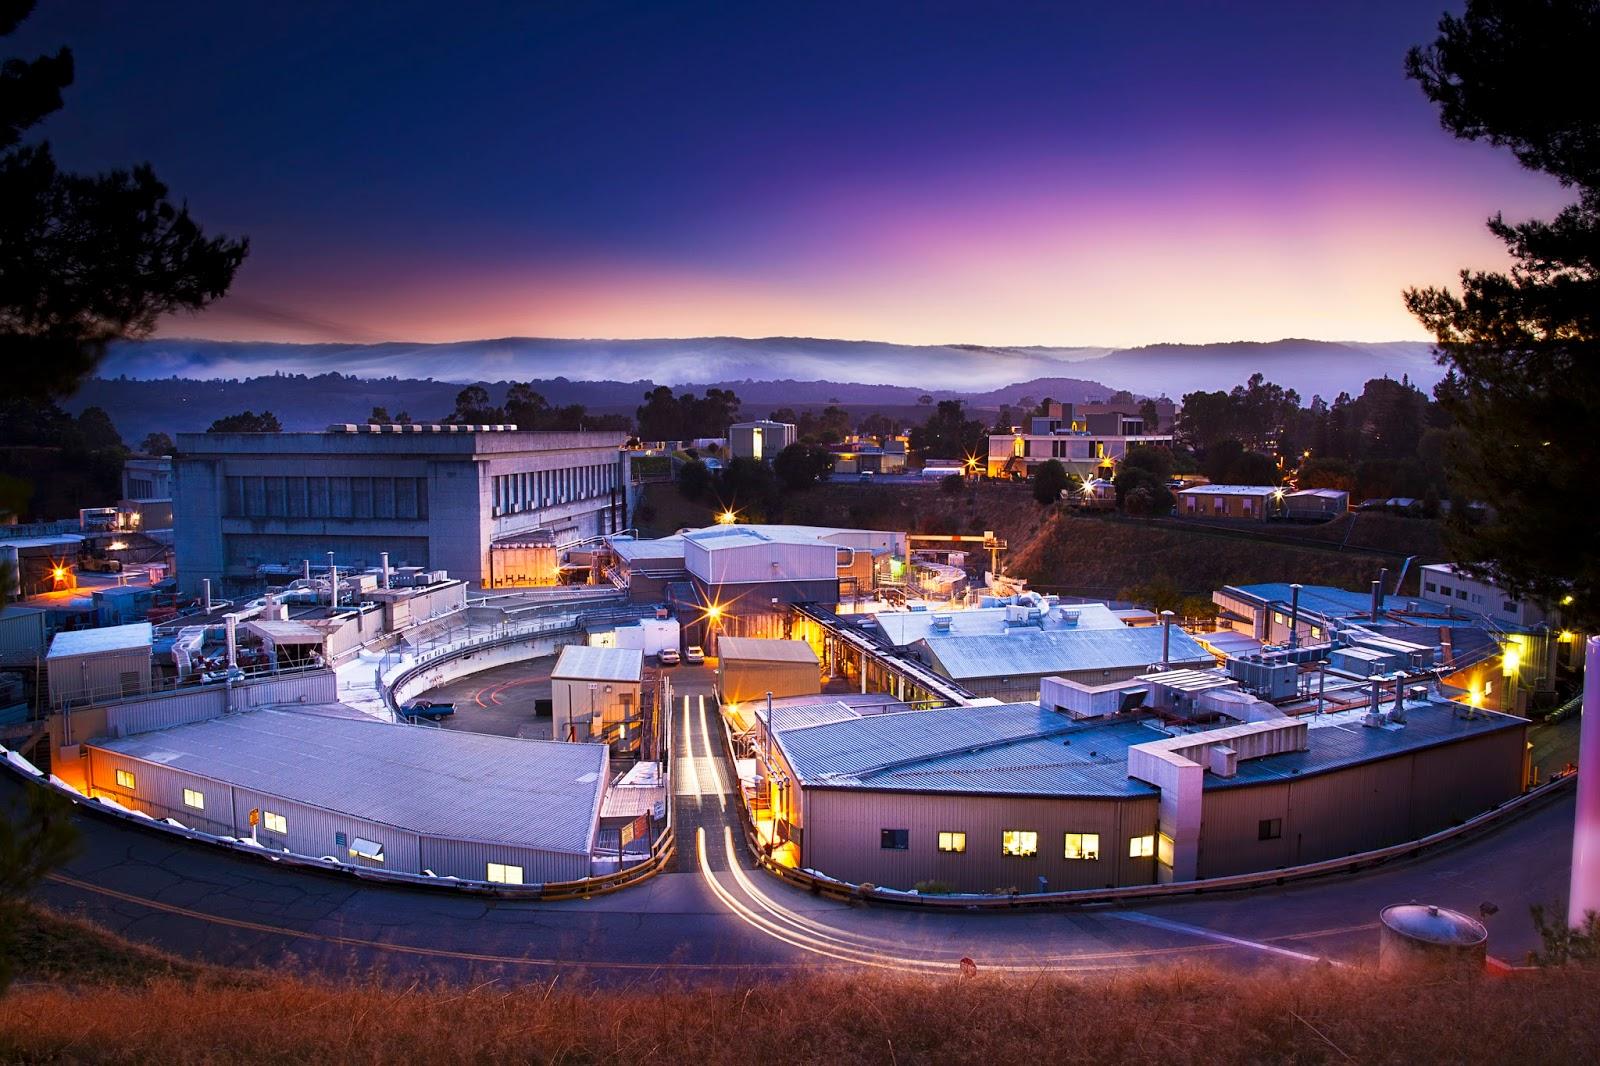 The Stanford Synchrotron Radiation Lightsource At Dusk Credit SSRL SLAC